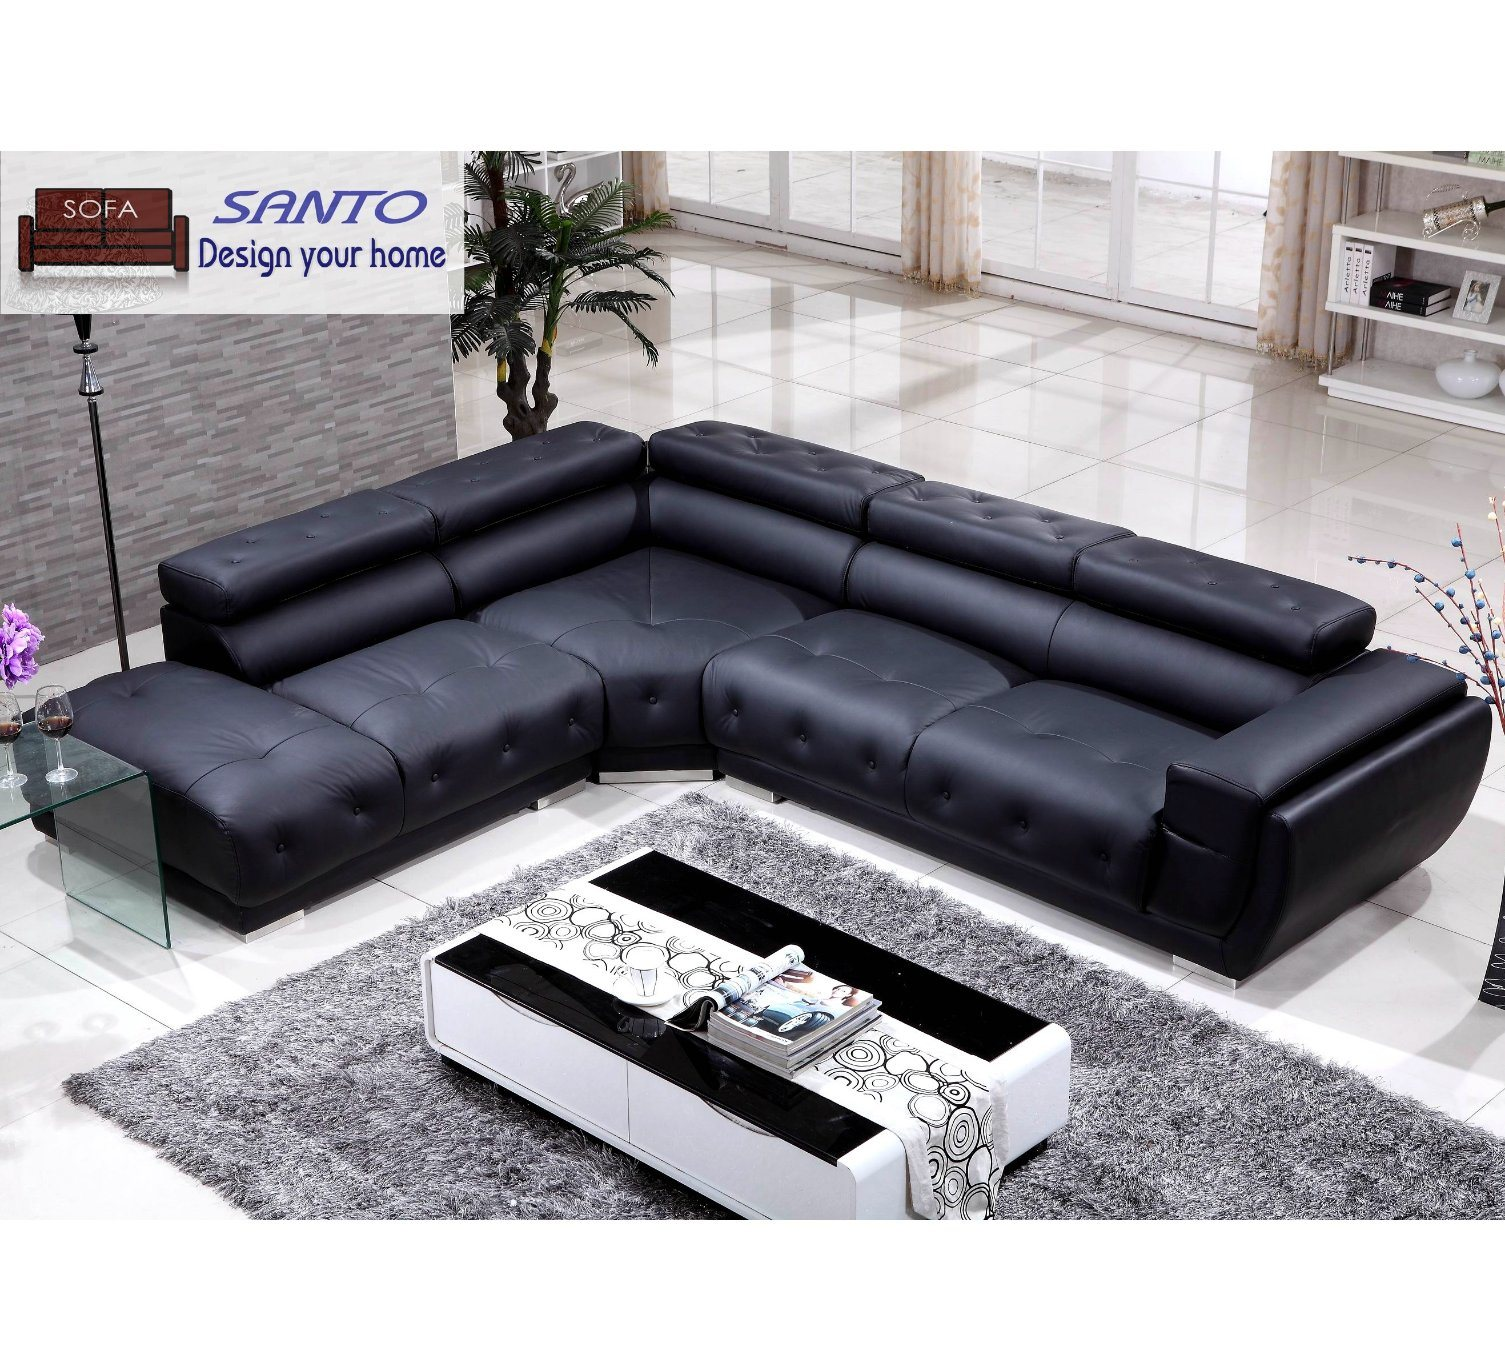 China 2020 Latest Design Sectional Leather Modern Corner Contemporary Corner Lounge Suites Genuine Leather Corner Leisure Corner American Sofa China Sofa Set Sofa